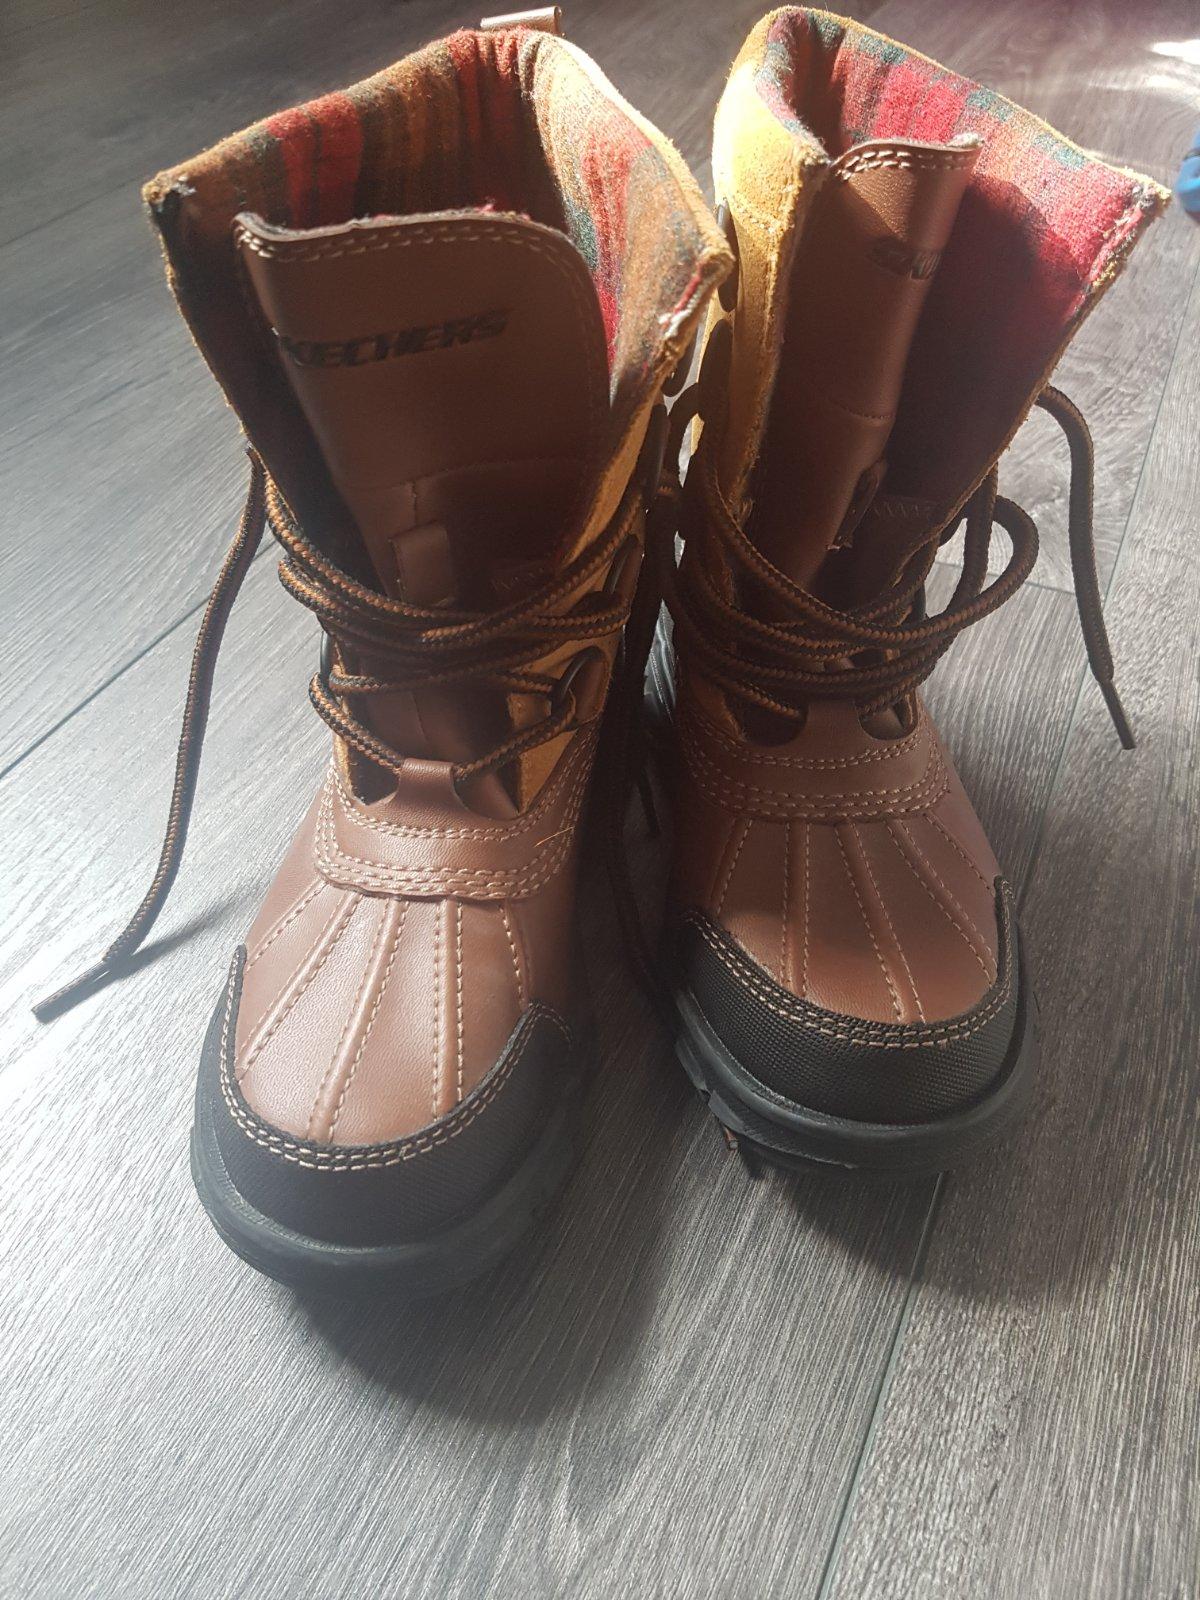 dce0b1834f Zimne topanky skechers